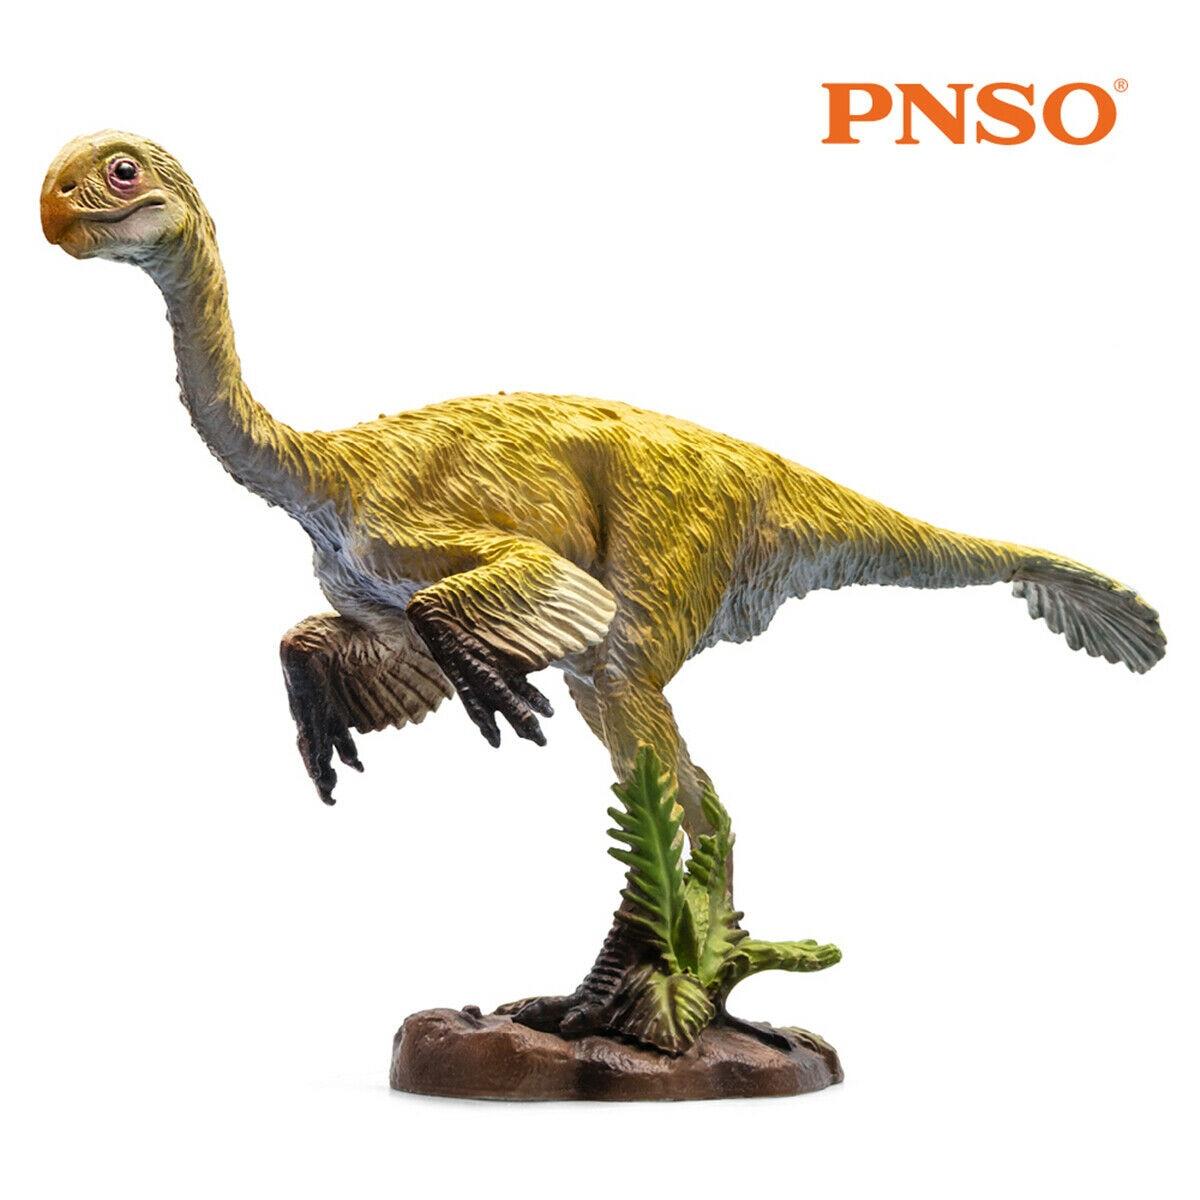 2019 PNSO Gigantoraptor Gignatraptor Dinosaur Figure Megaraptor Collector Animal Decor Kids Toys Science Art Model Birthday Gift